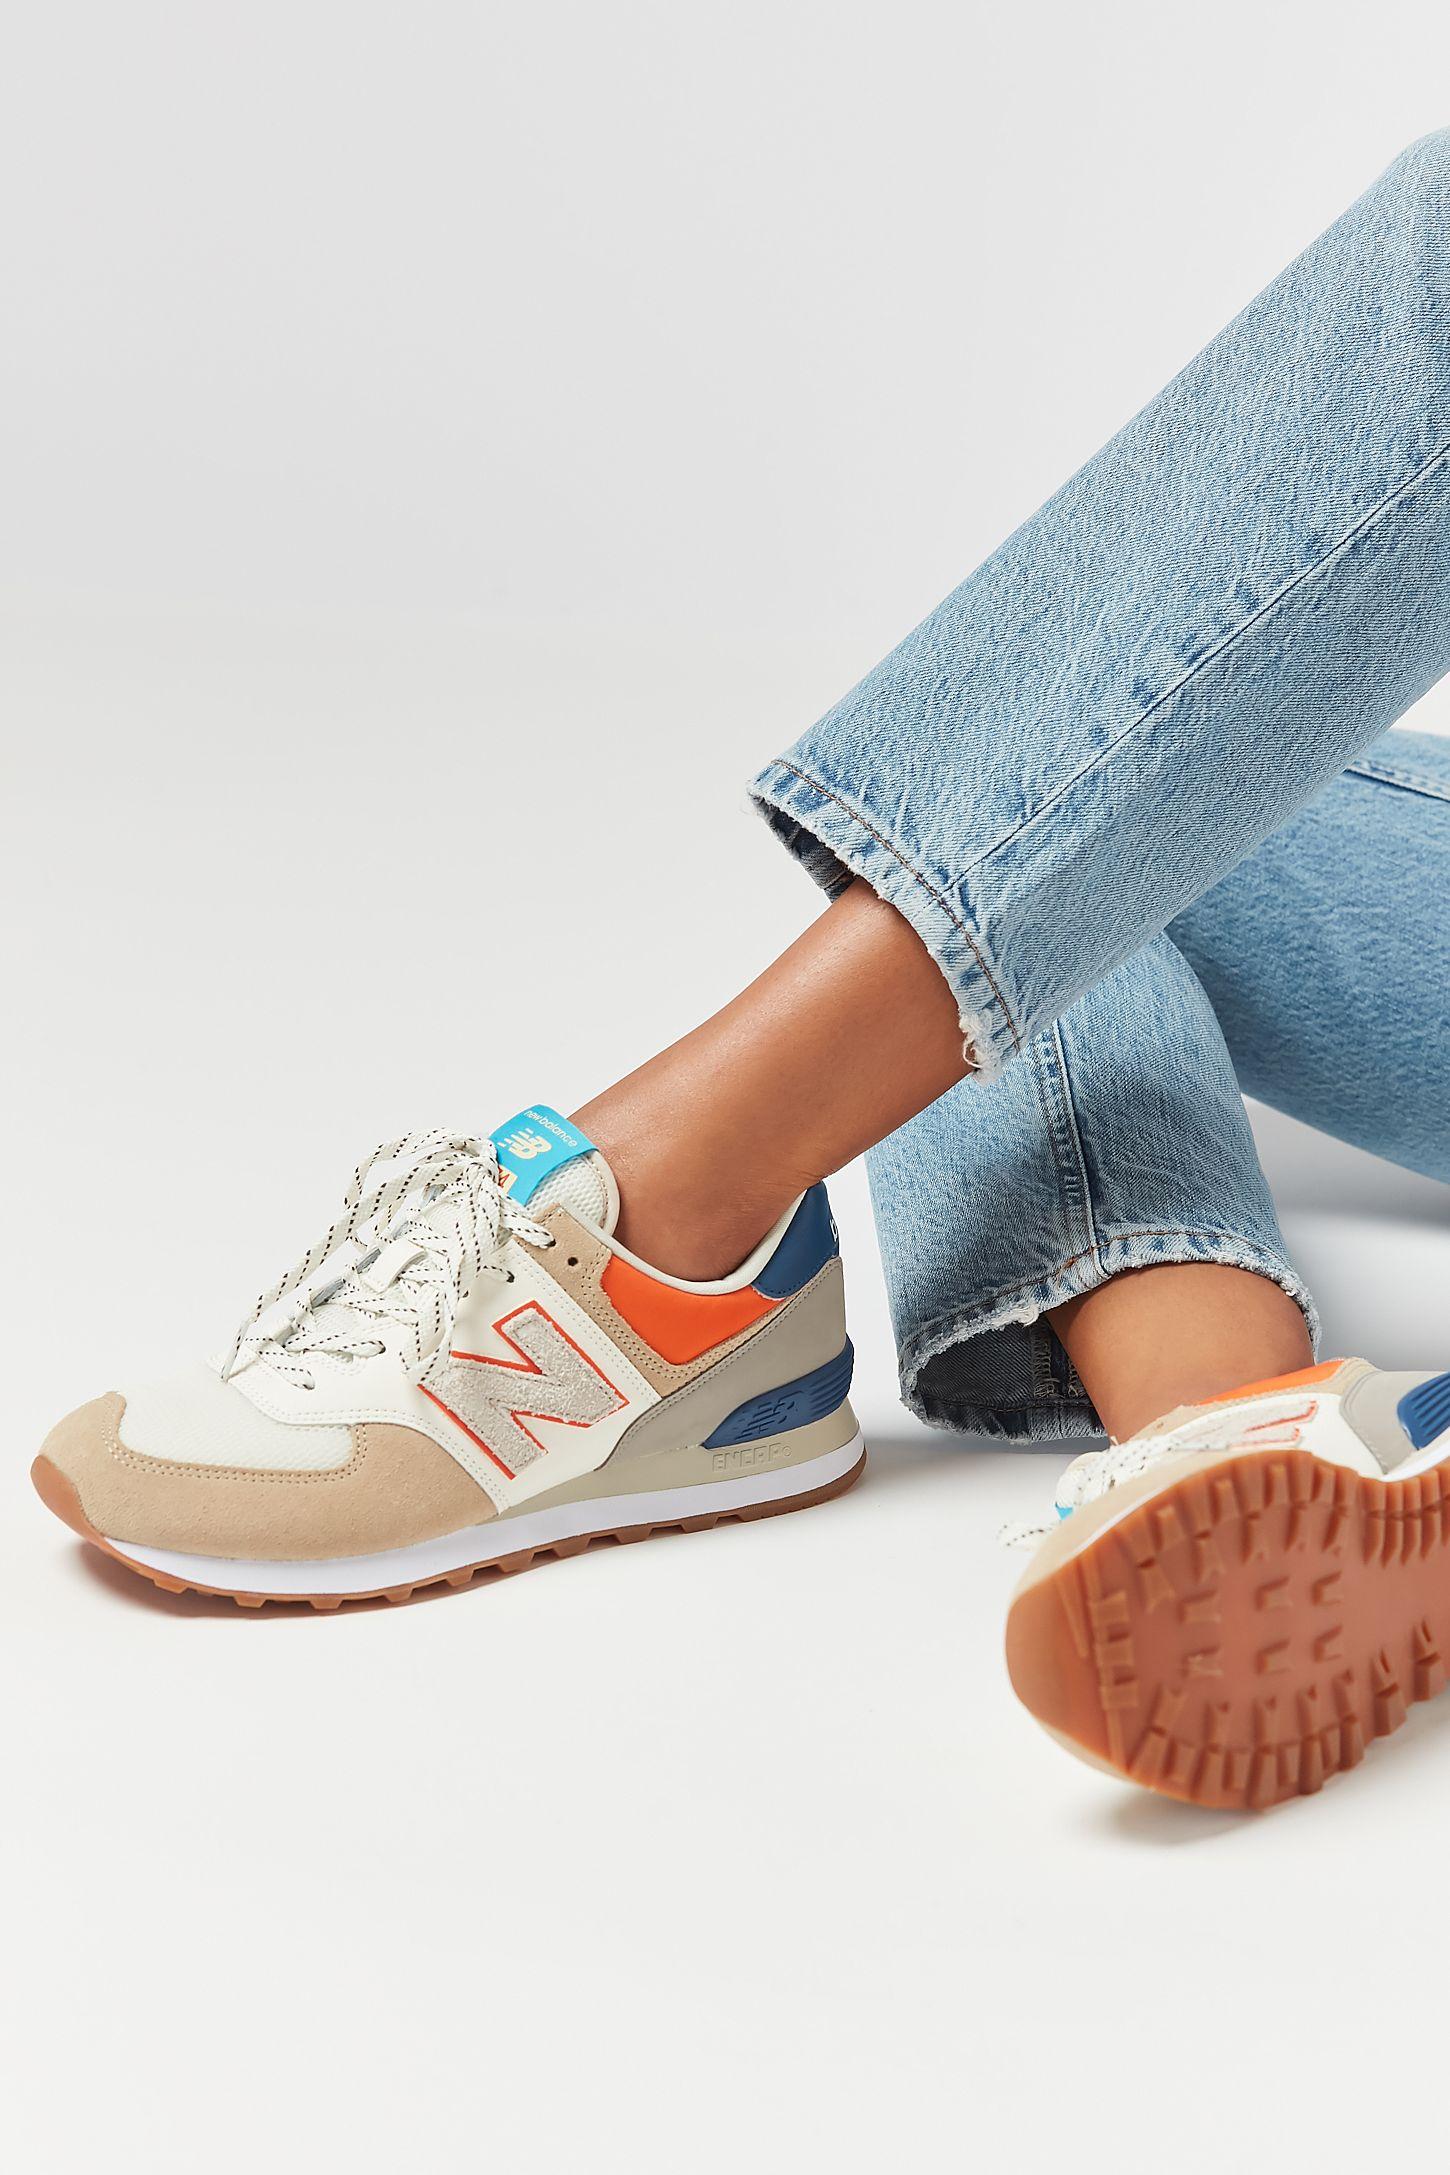 sports shoes 8b6eb f9ddc New Balance 574 Moon Lantern Sneaker